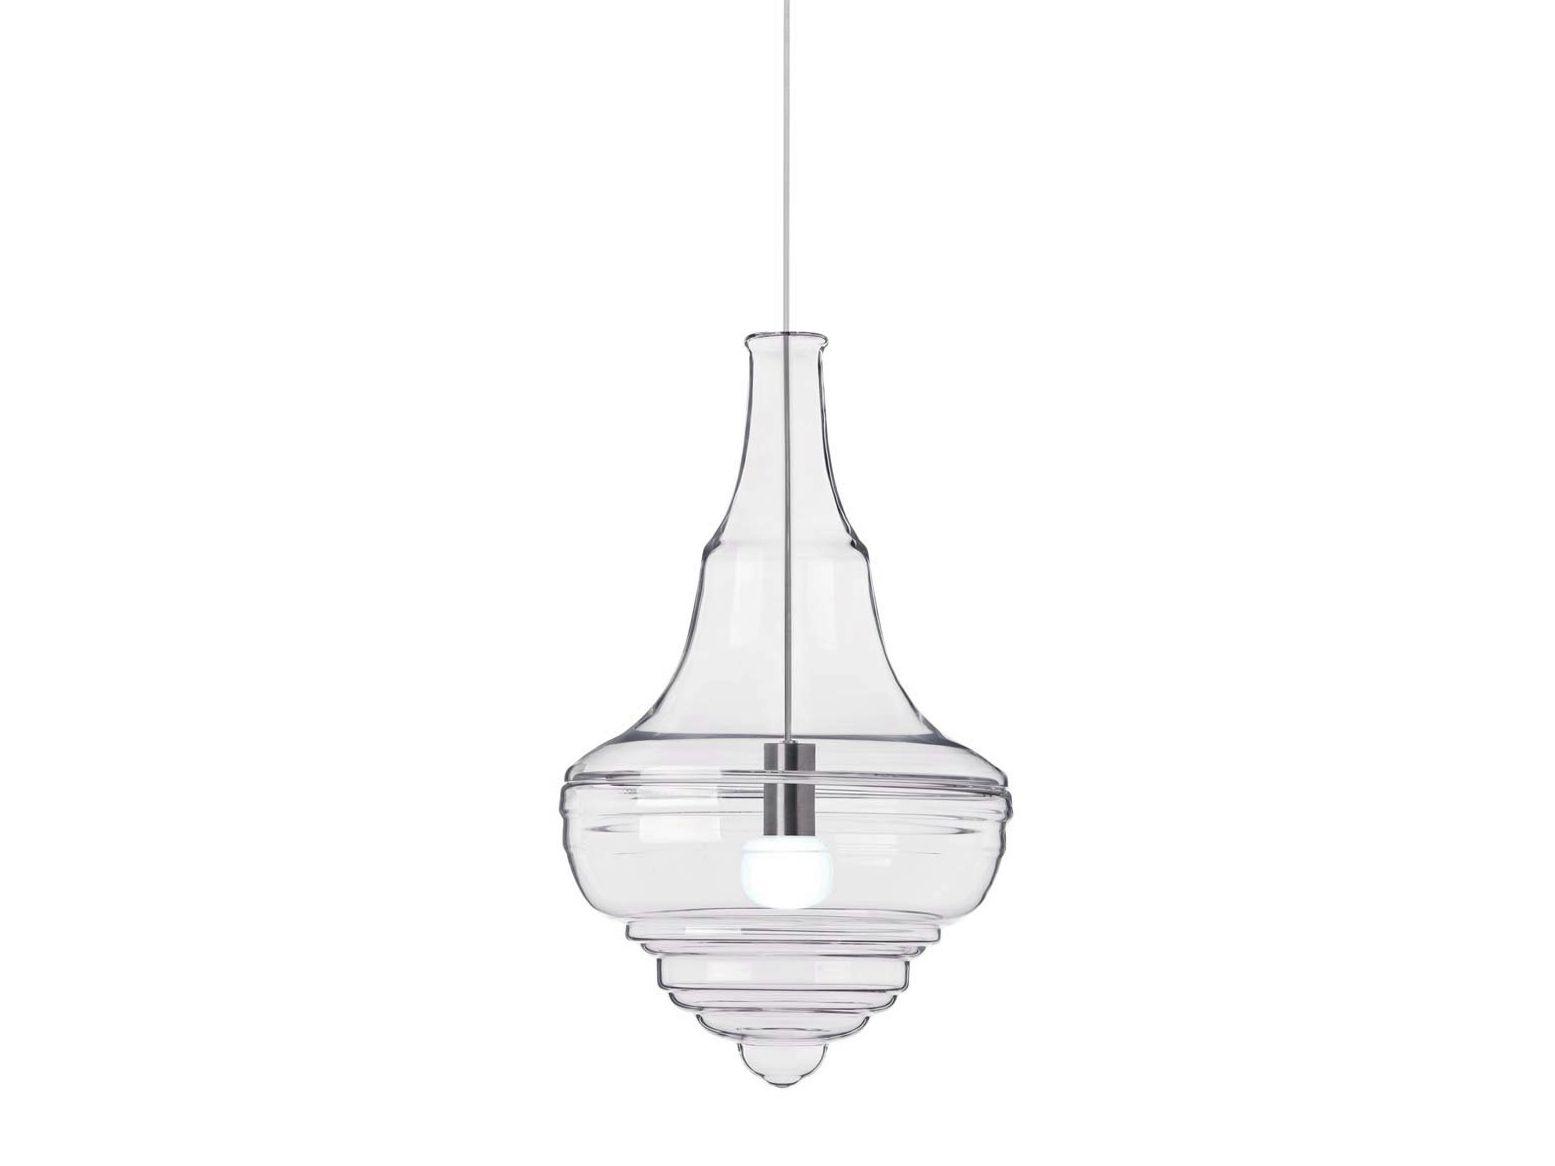 suspension en verre souffl prague estates theatre collection design lighting by lasvit design. Black Bedroom Furniture Sets. Home Design Ideas